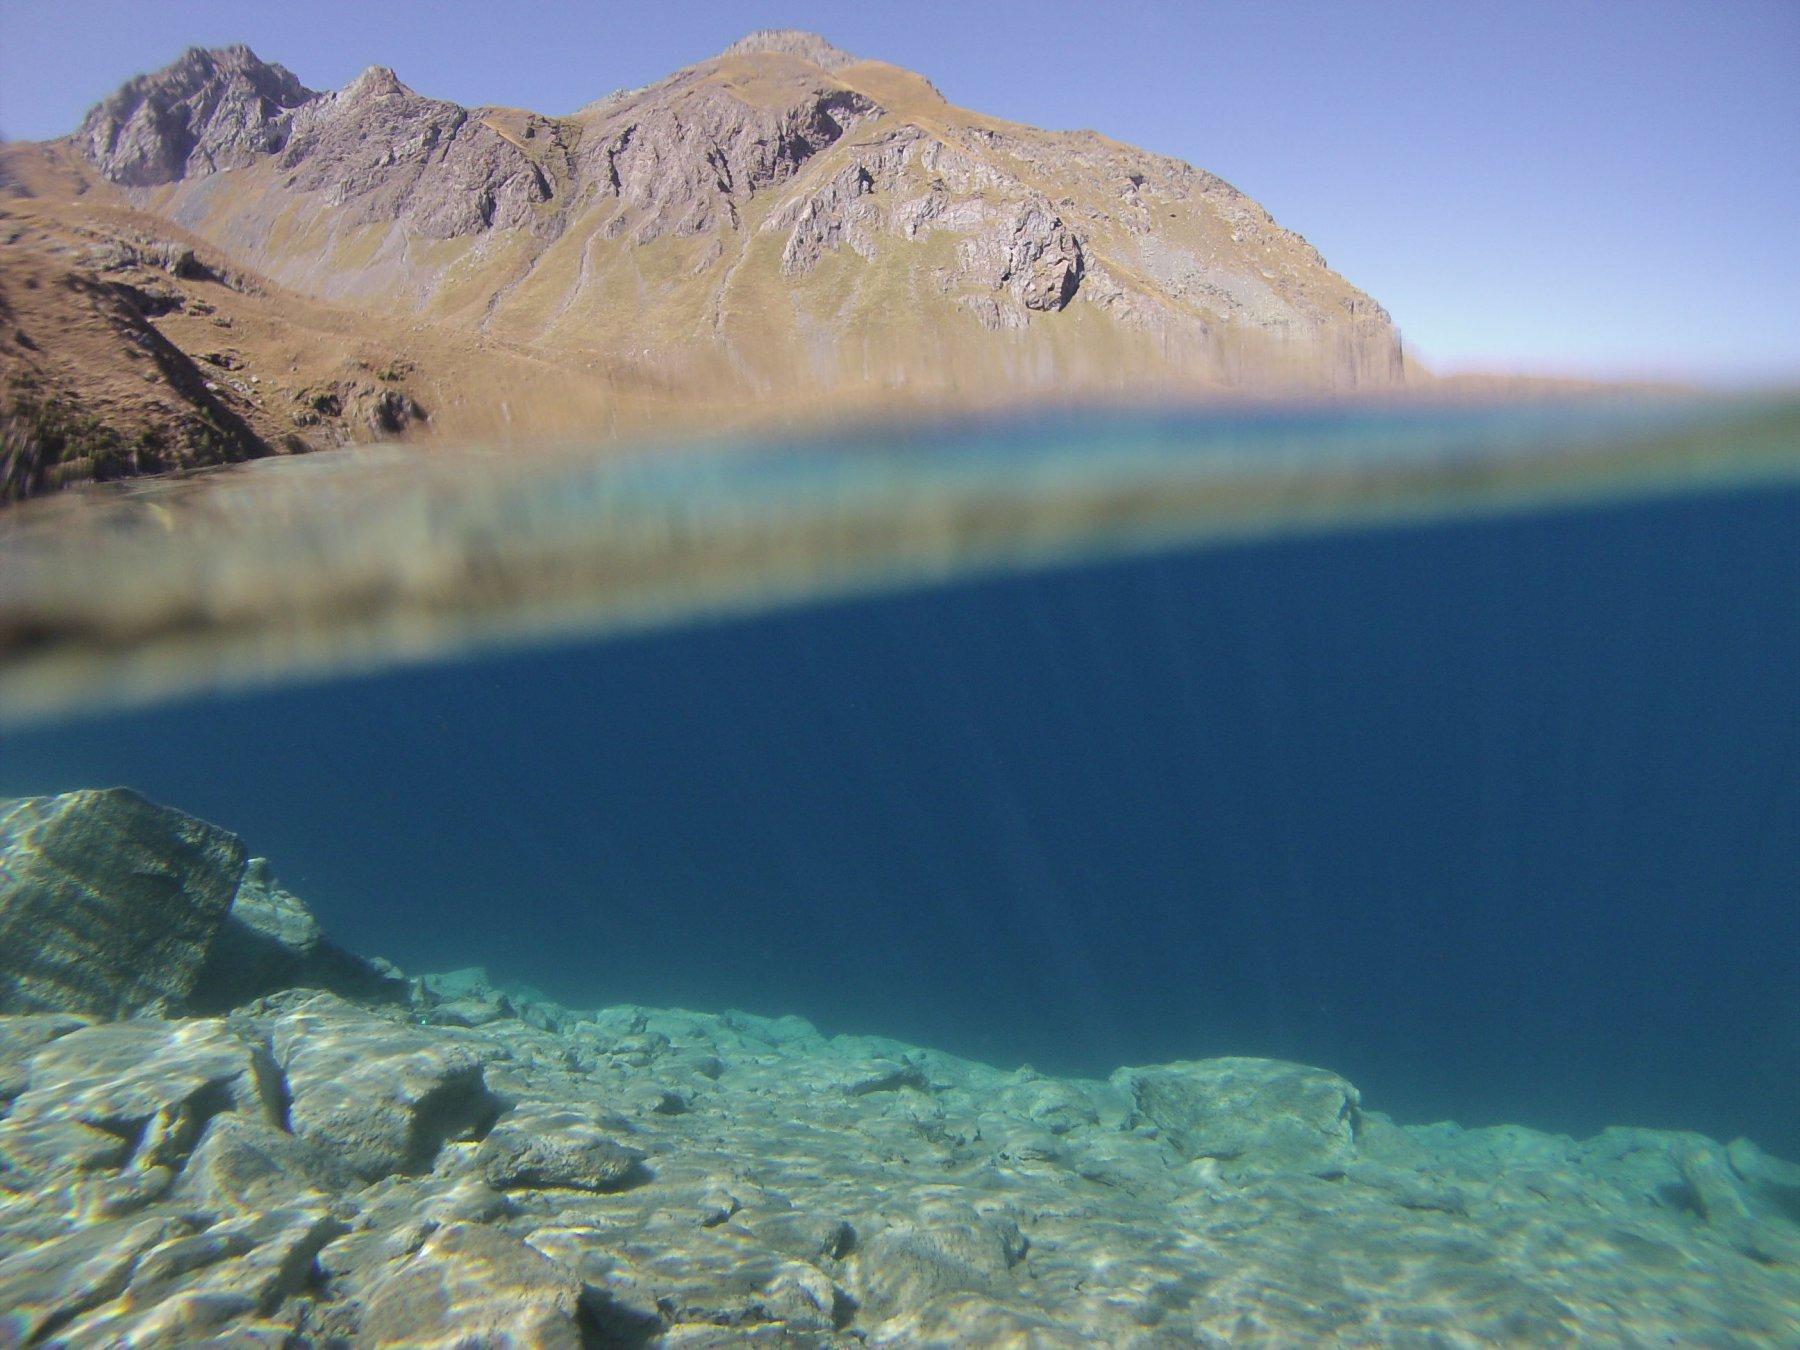 sott'acqua